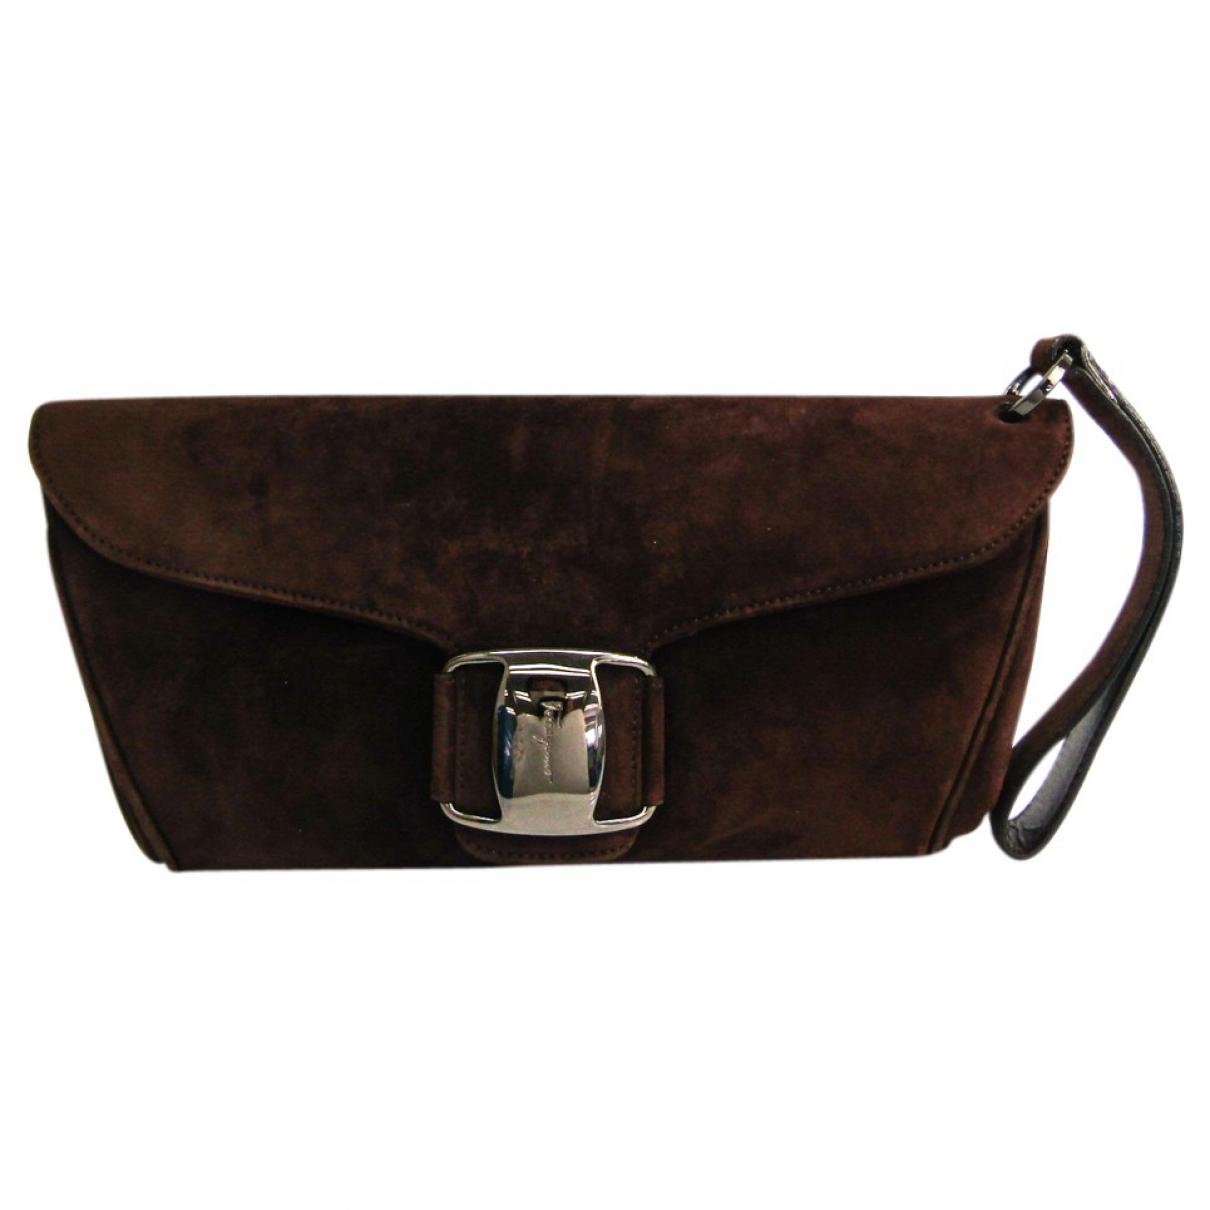 Salvatore Ferragamo N Brown Suede Clutch bag for Women N